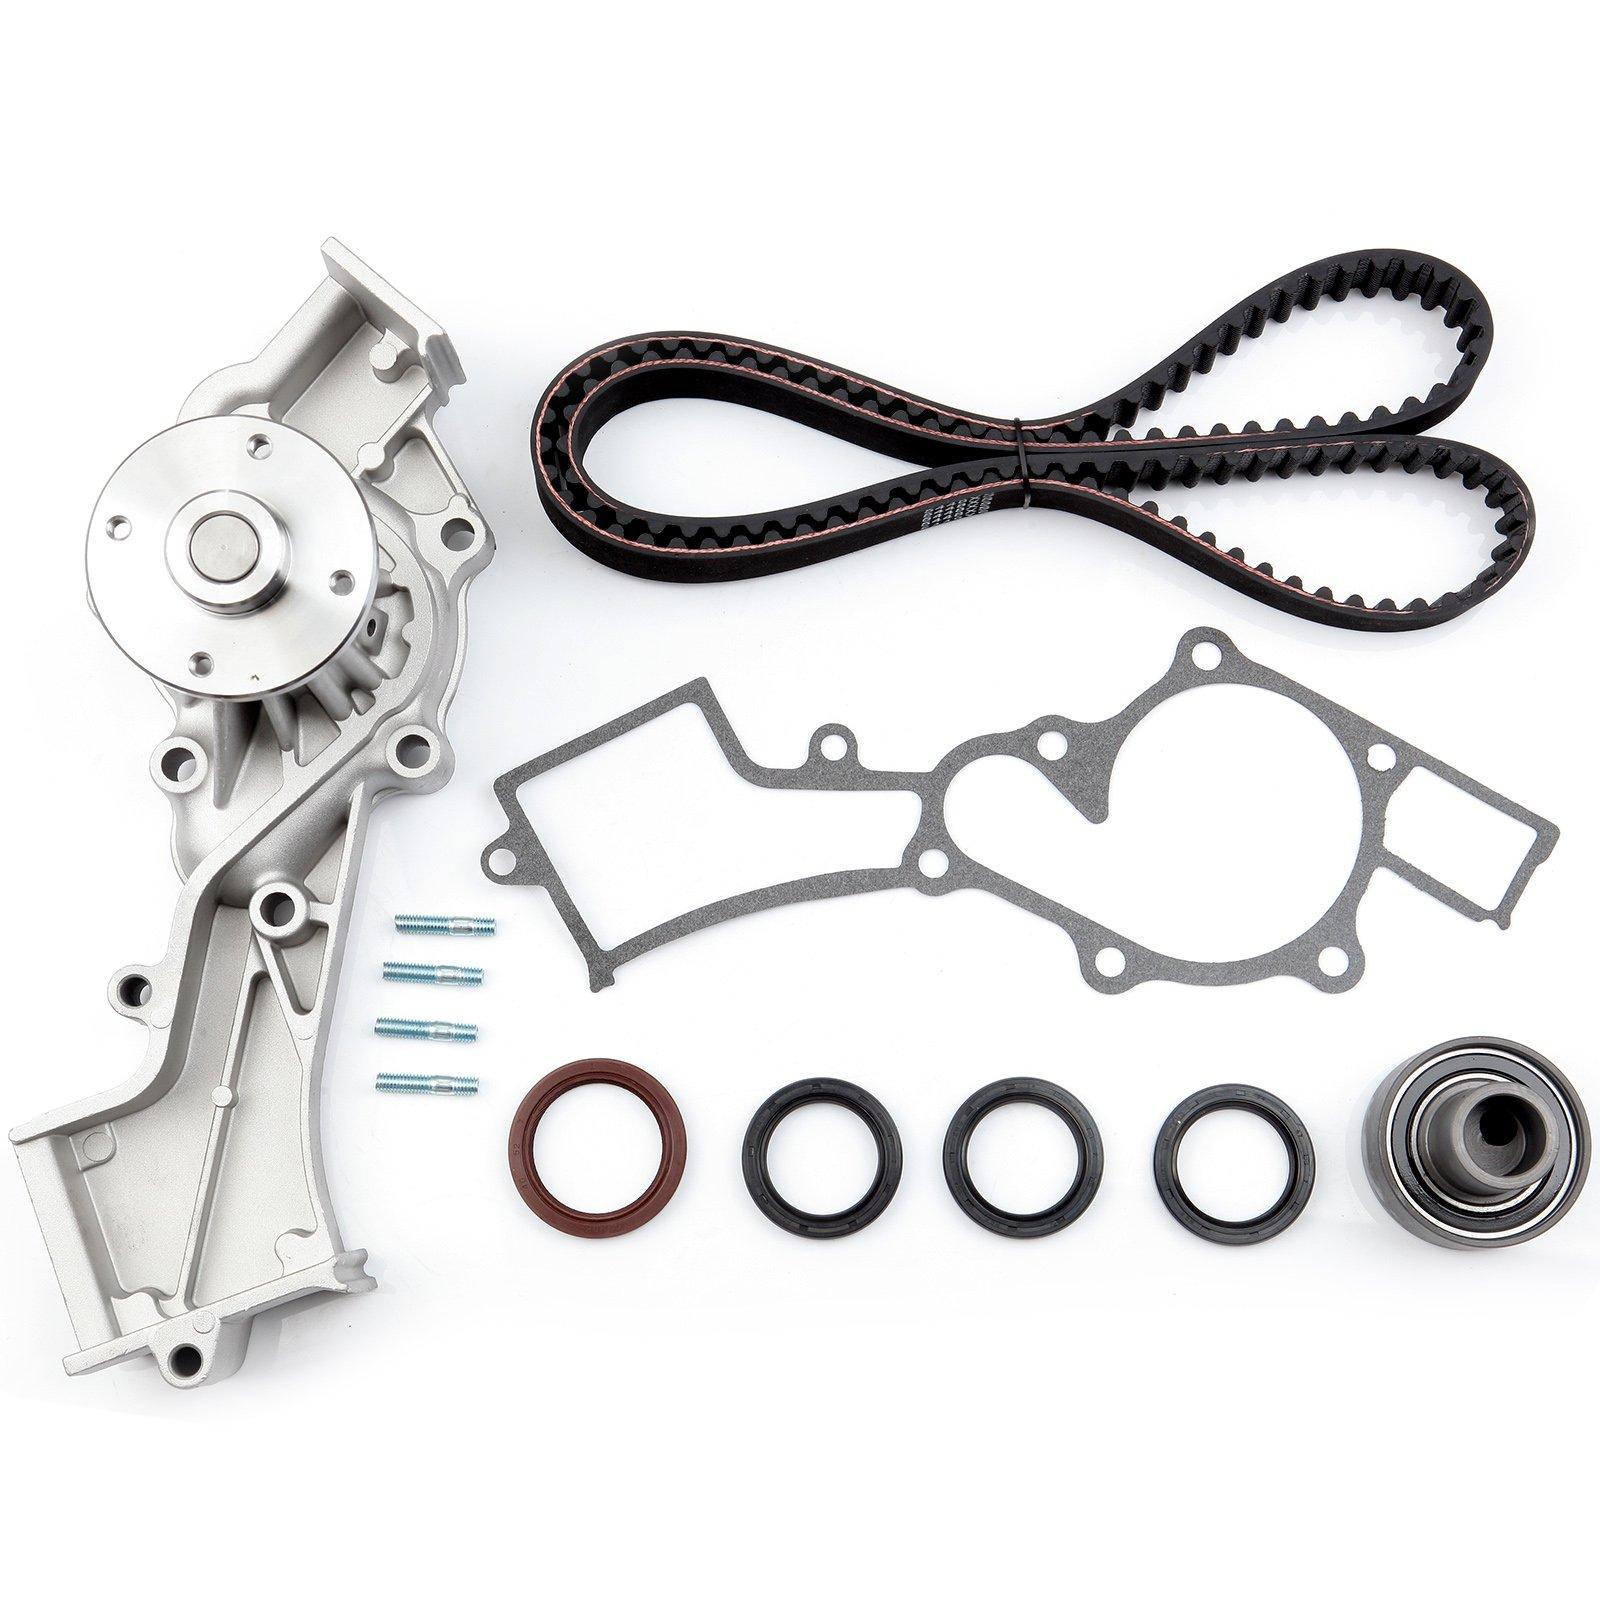 ECCPP Timing Belt Water Pump Kit Fit for 1999 2000 2001 2002 2003 2004 Nissan Frontier//2000 2001 2002 2003 2004 Nissan Xterra